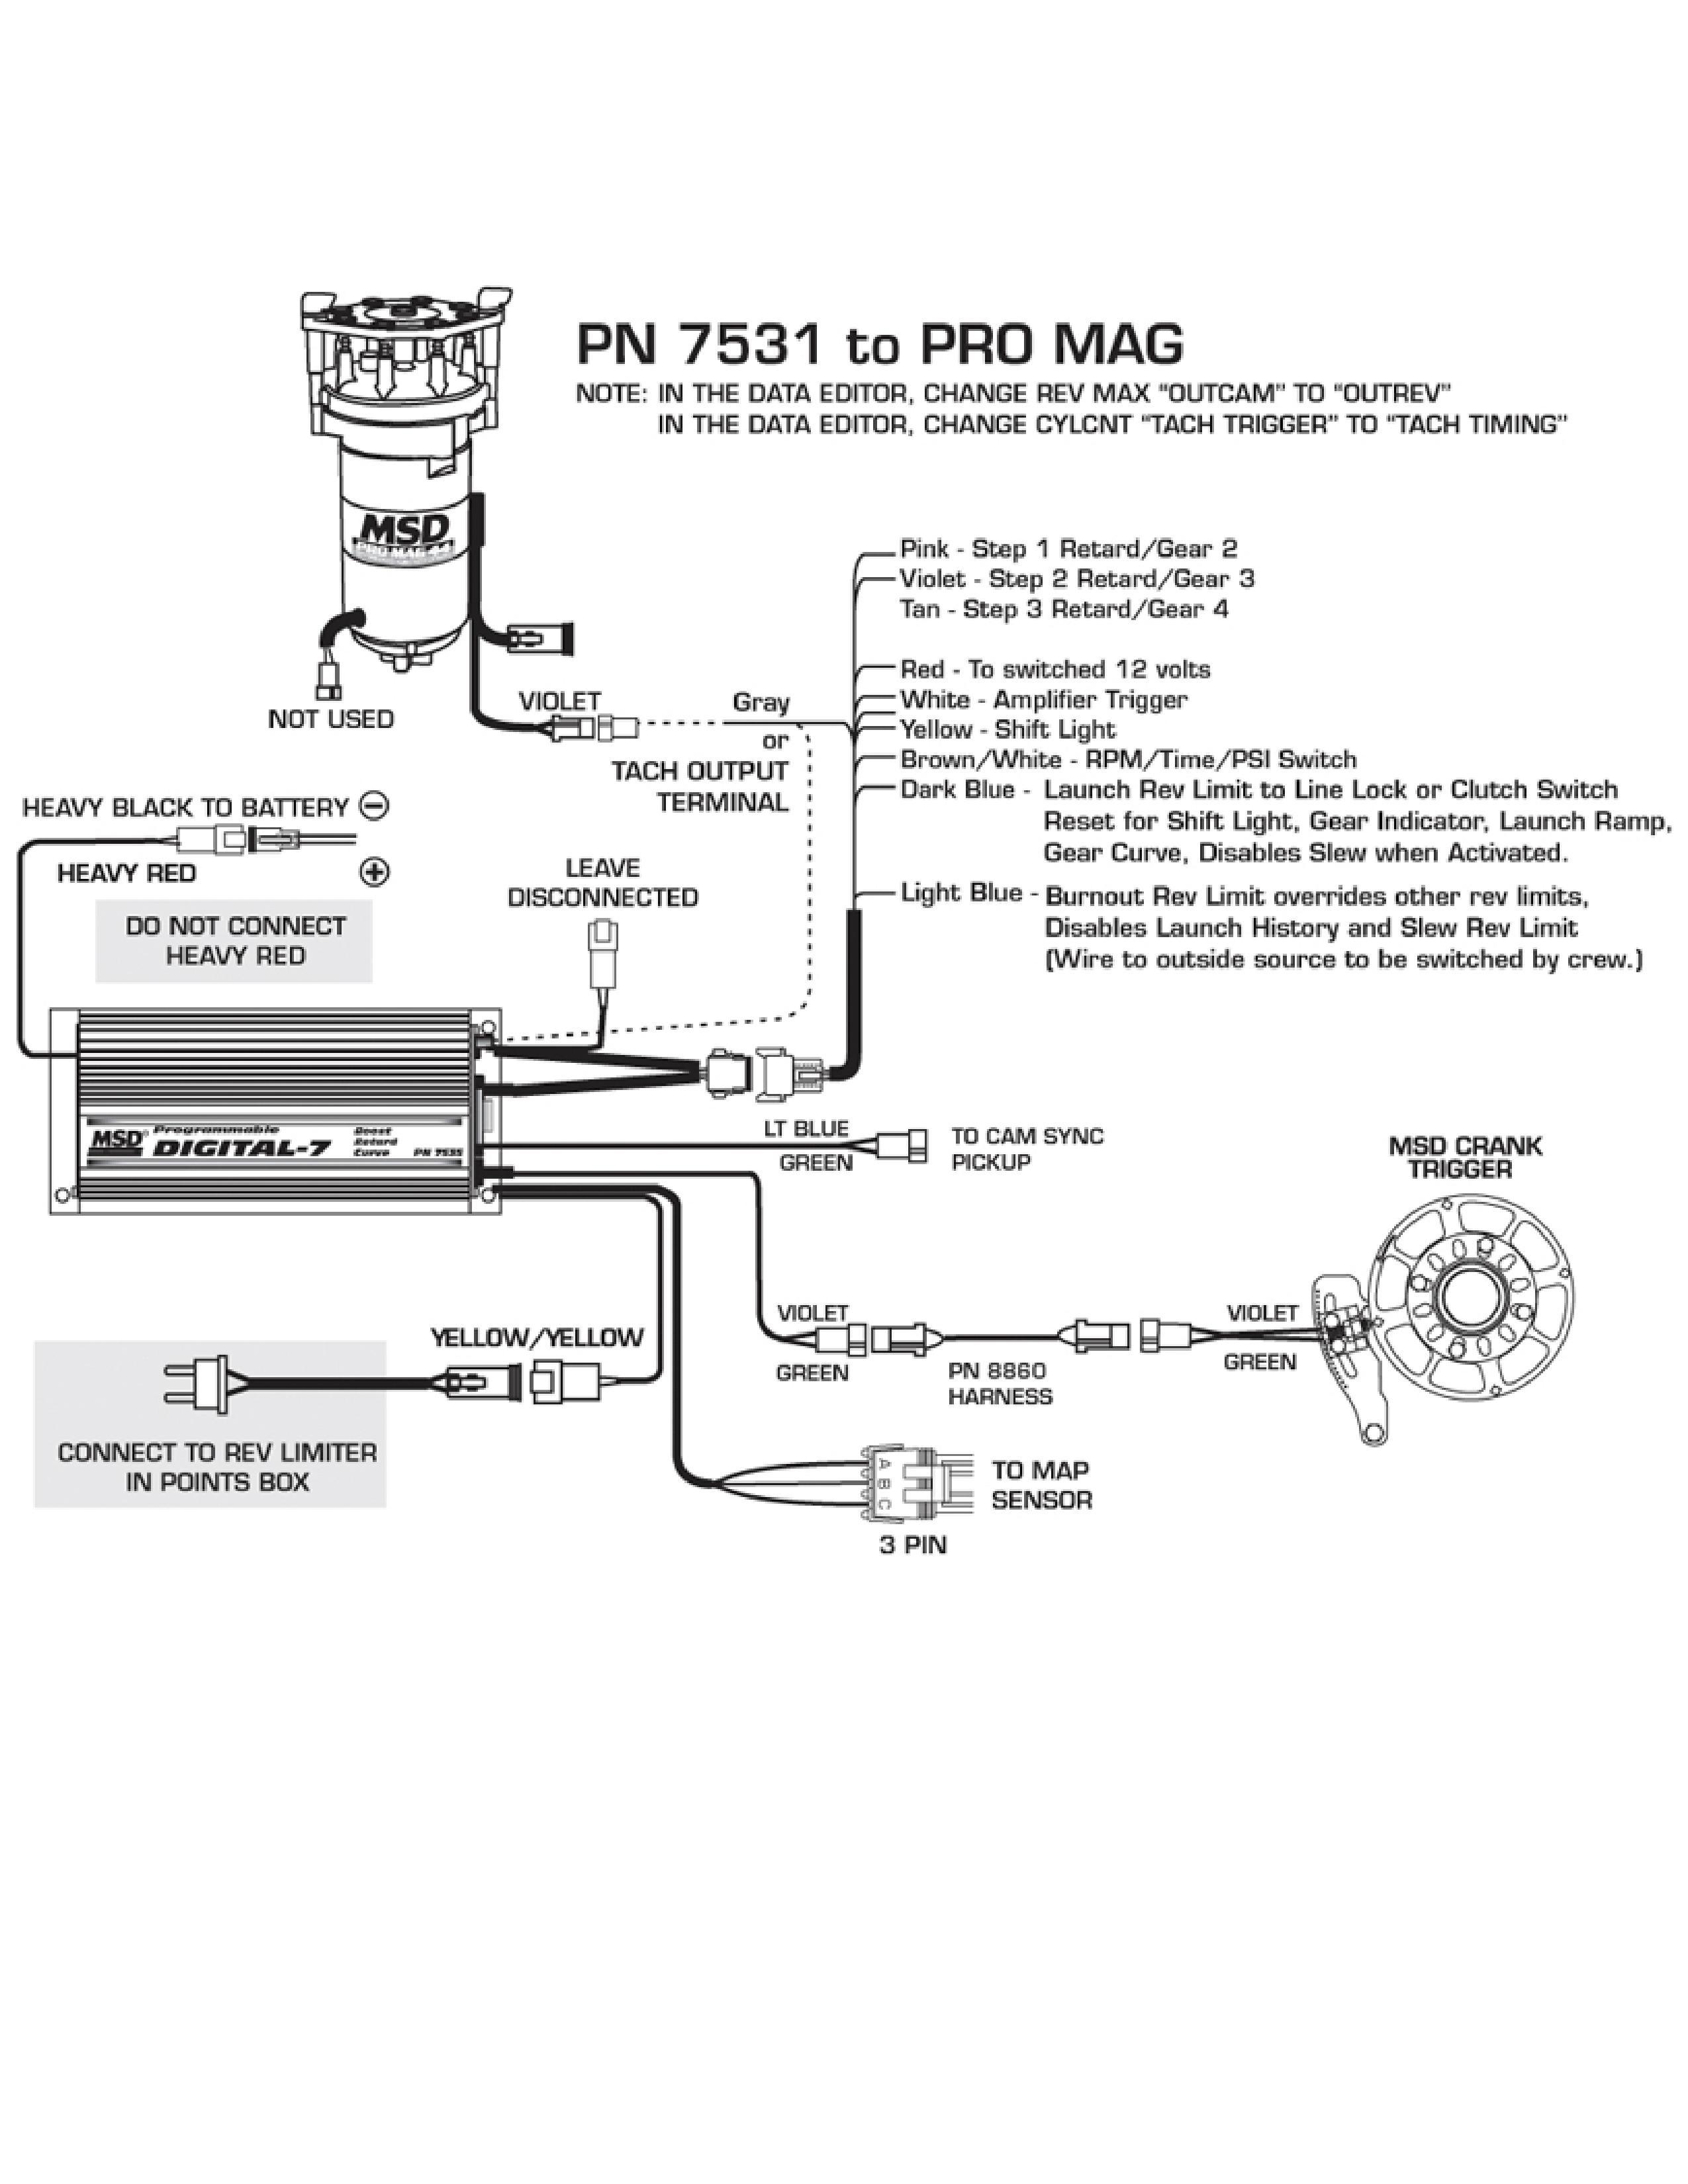 mallory promaster coil and distributor wiring diagram unilite promaster free printable